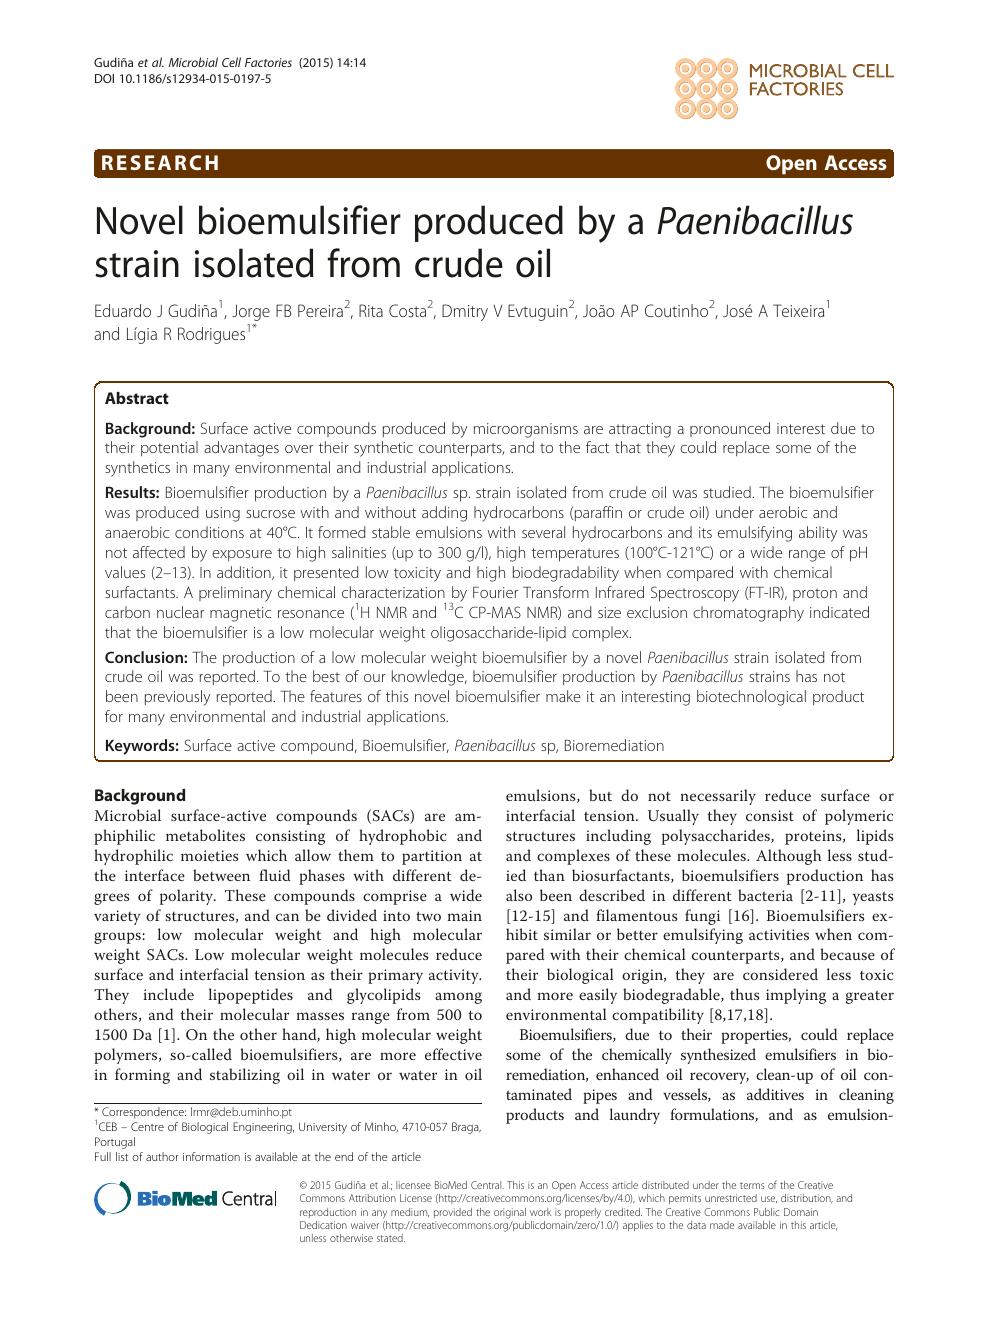 Novel bioemulsifier produced by a Paenibacillus strain